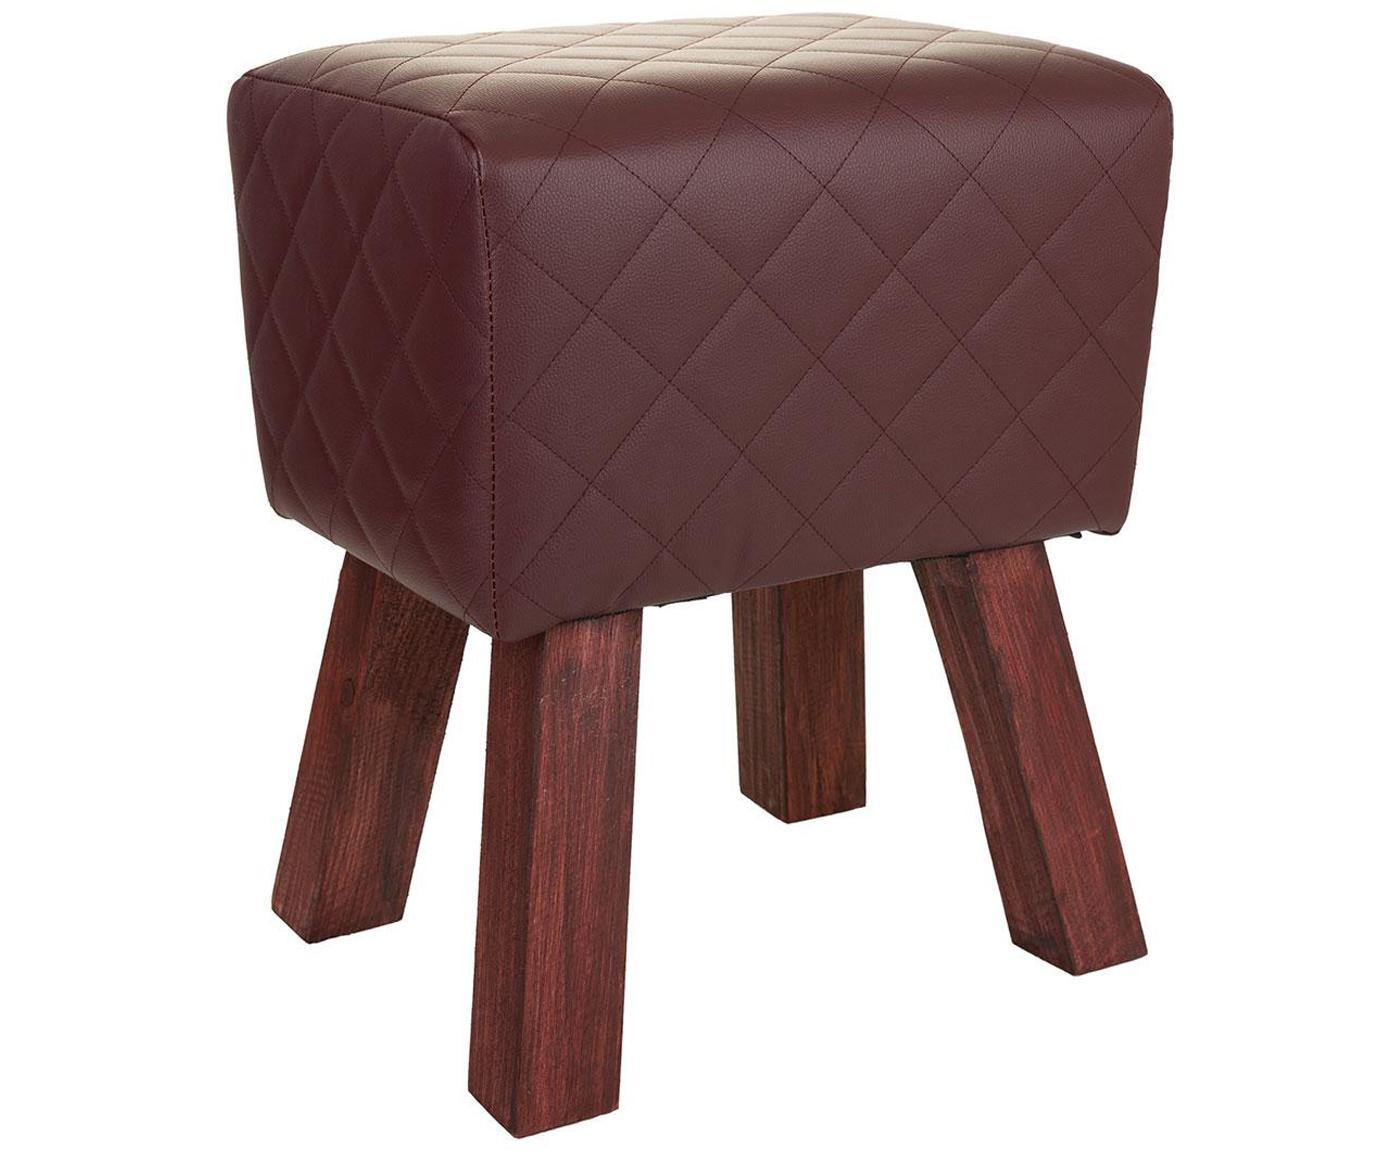 Taburete tapizado Leire, Patas: madera, Tapizado: cuero sintético, Marrón, An 36 x Al 47 cm